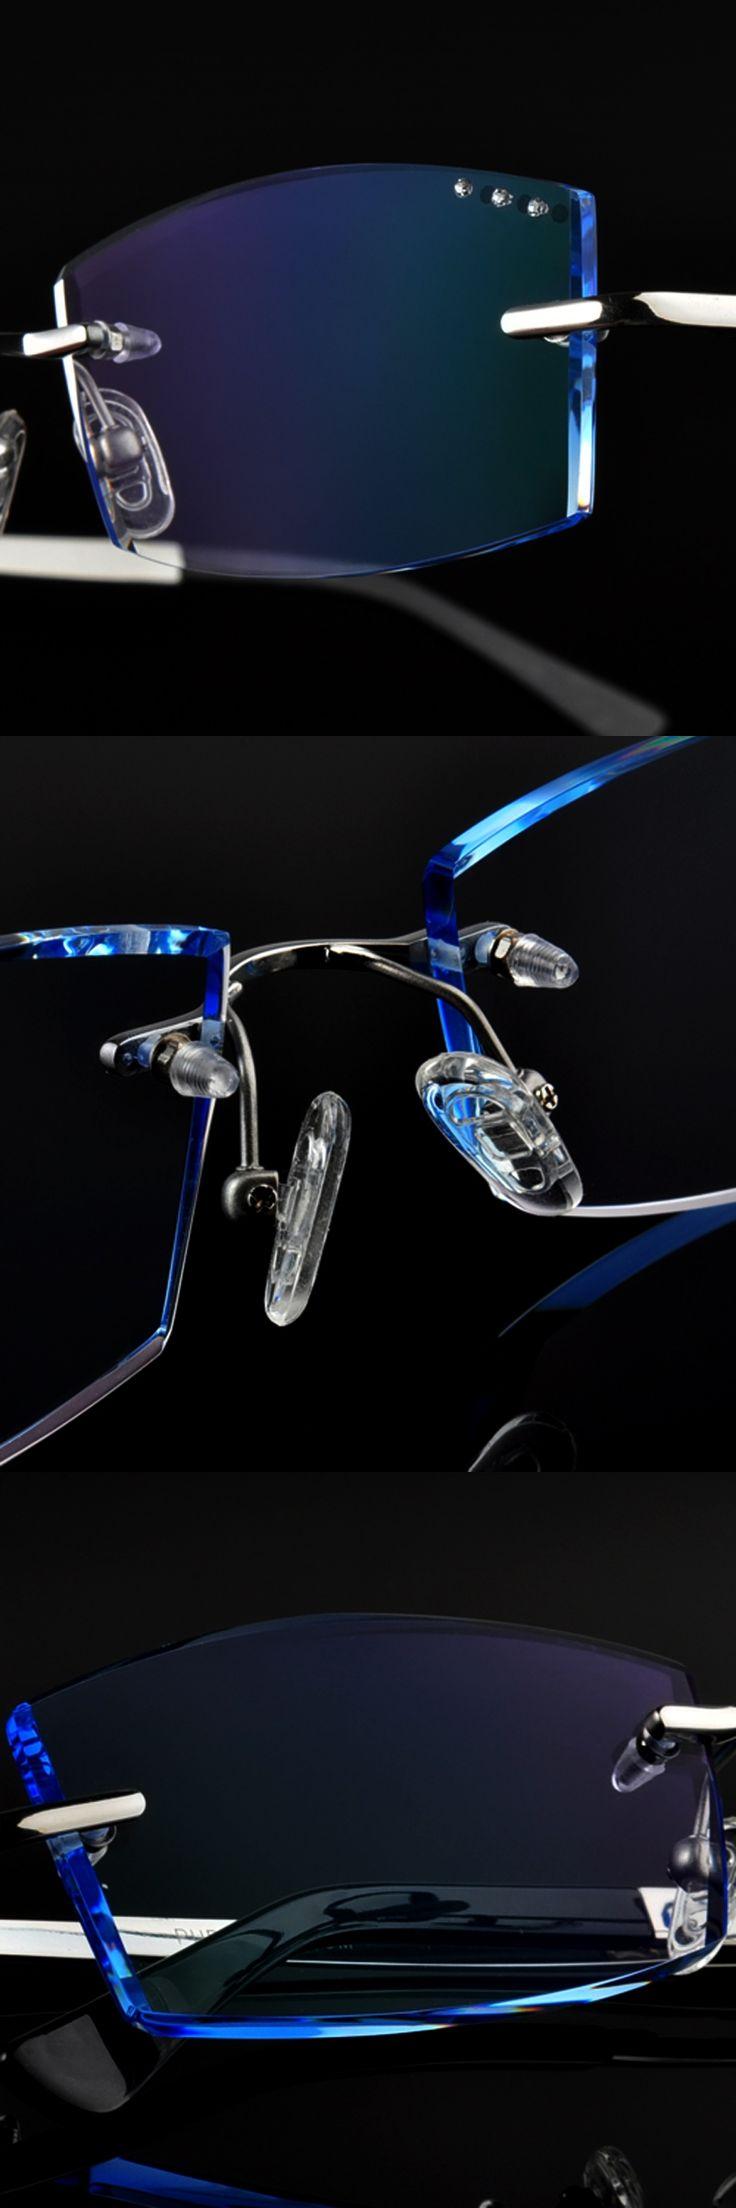 Men's fashion eyewear, trimming diamond titanium rimless glasses, ultra-light ultra-brake wear shatterproof, Eyeglasses 83